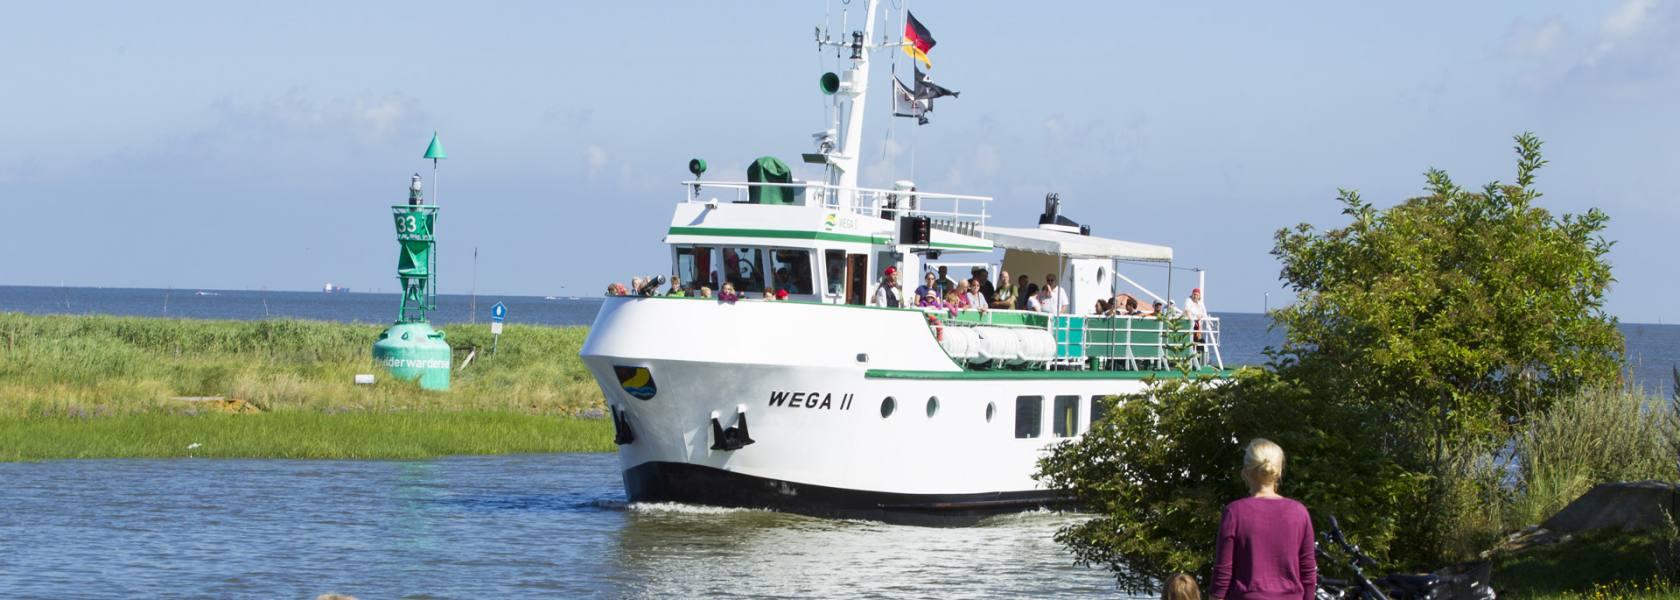 Wega II in Fedderwardersiel, © Tourismus-Service Butjadingen